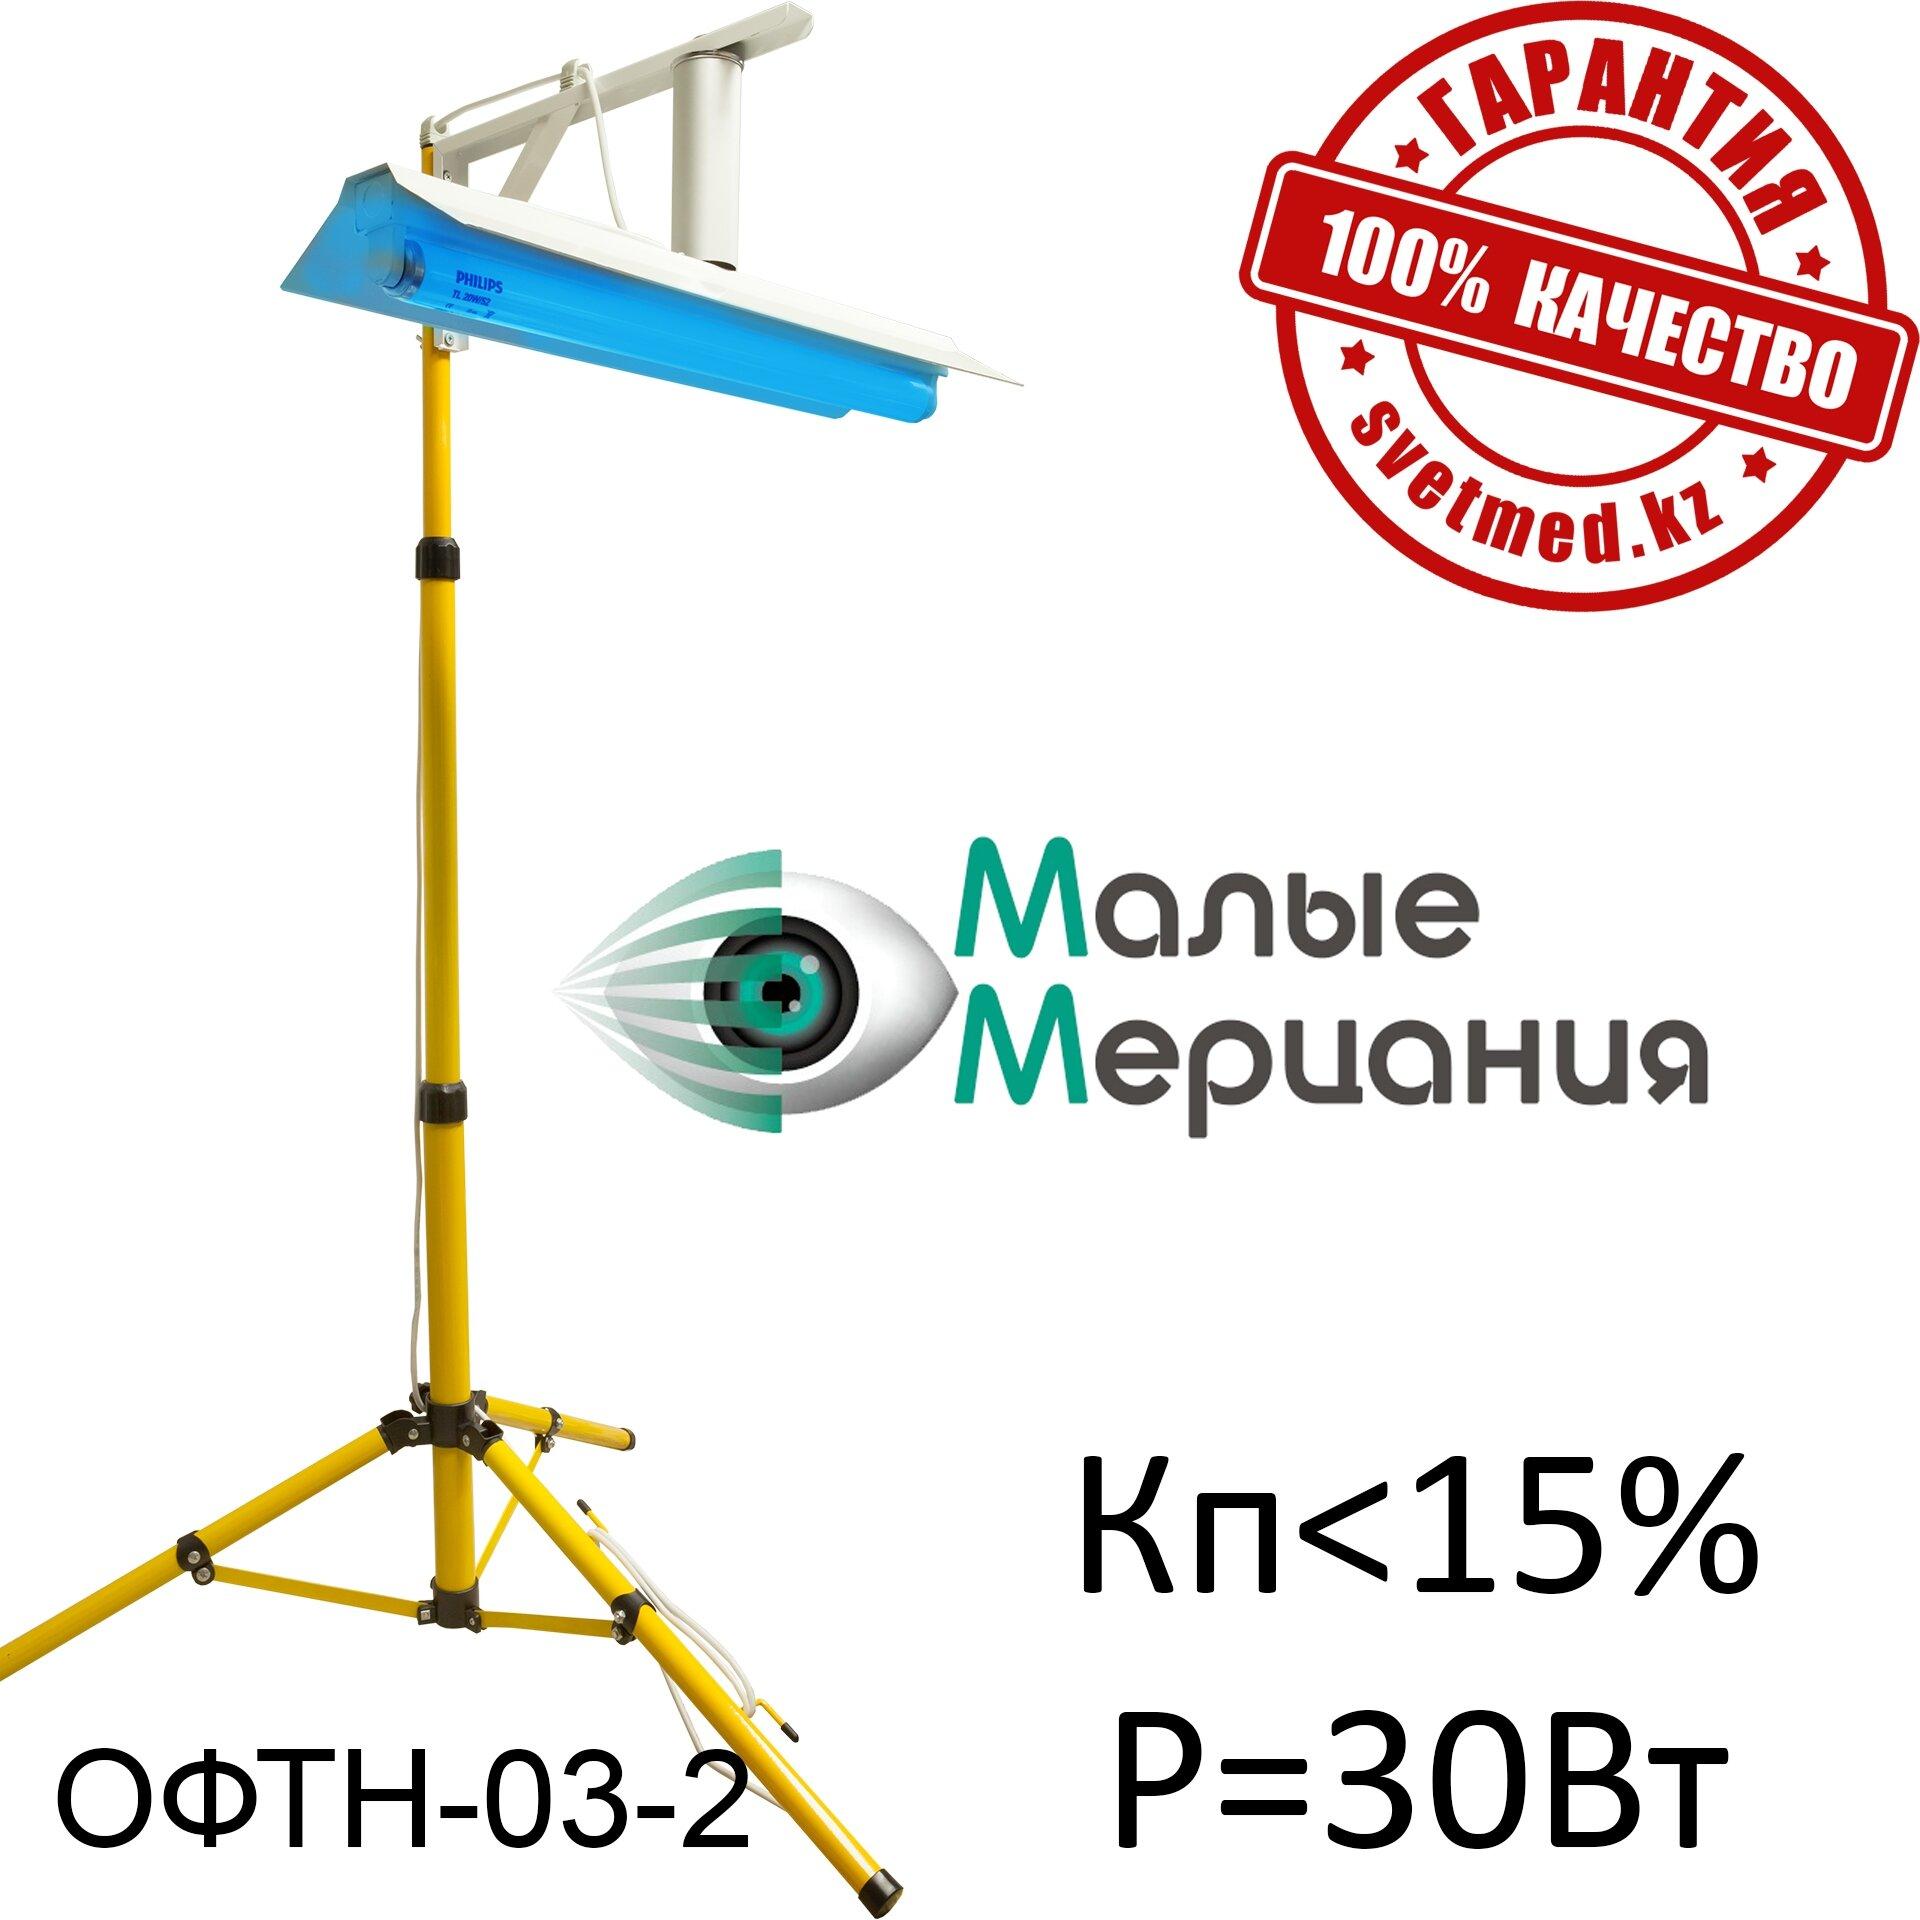 модель ОФТН-03-2 (Кп≤15%)